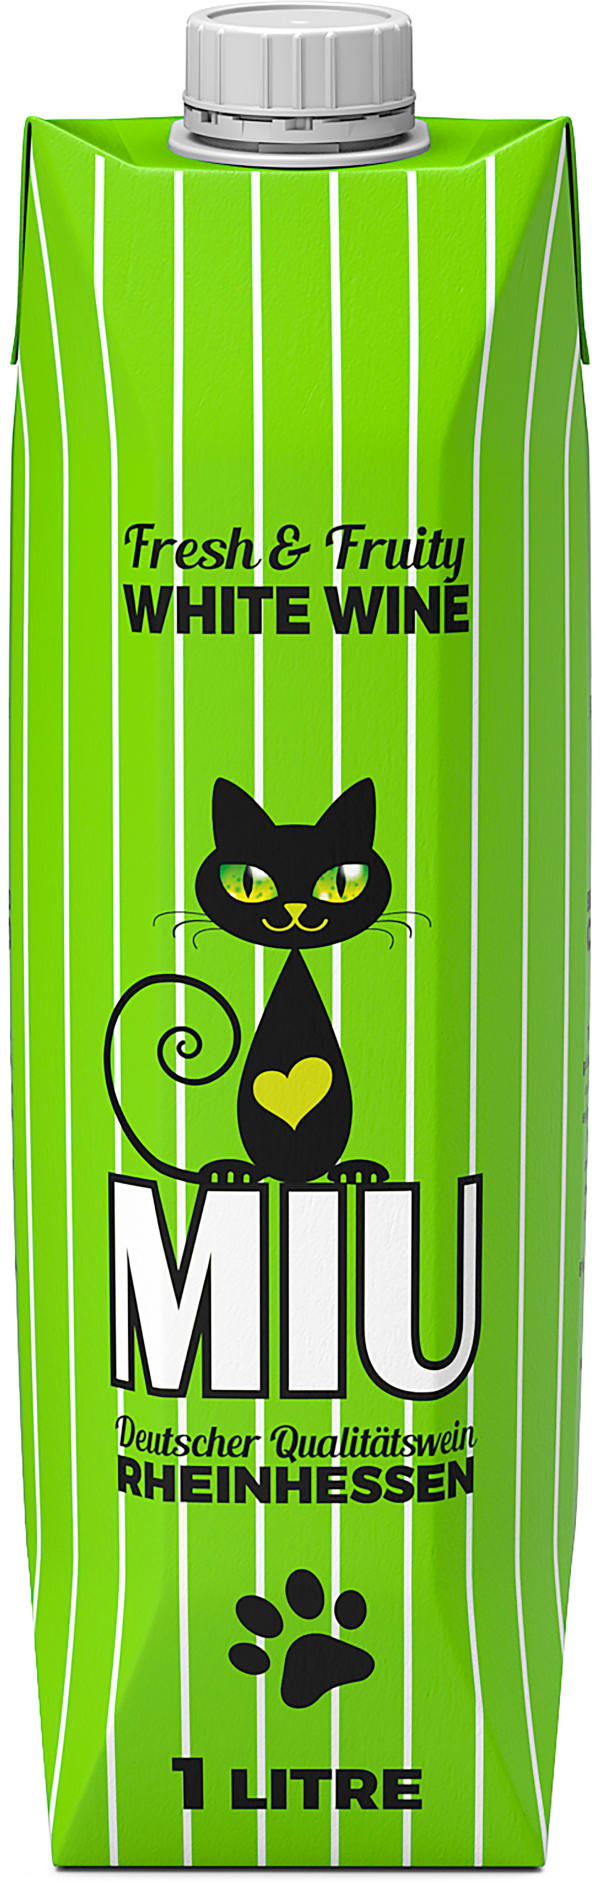 Miu White Wine 2019 carton package